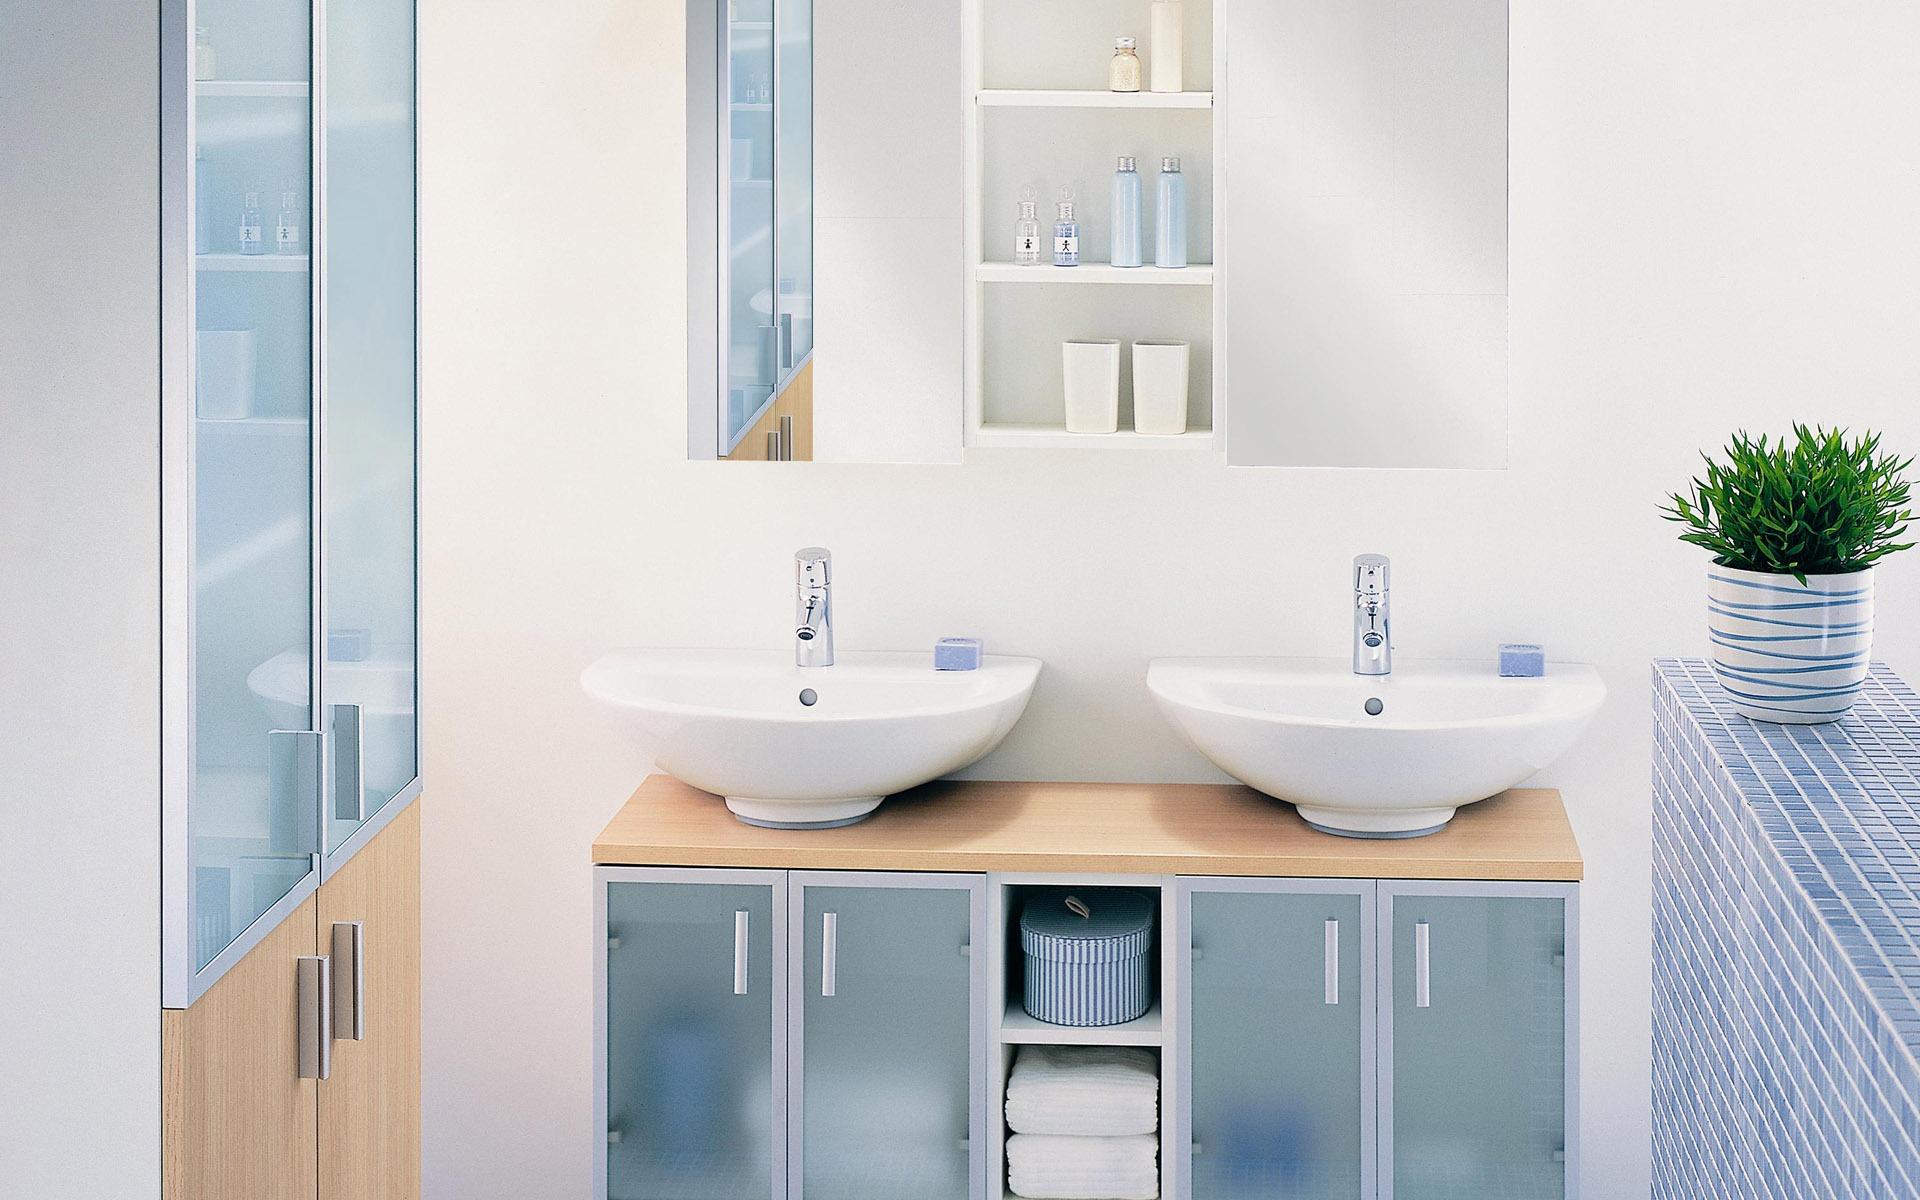 Fond d 39 cran photo salle de bain 2 1 1920x1200 fond d for Ecran salle de bain